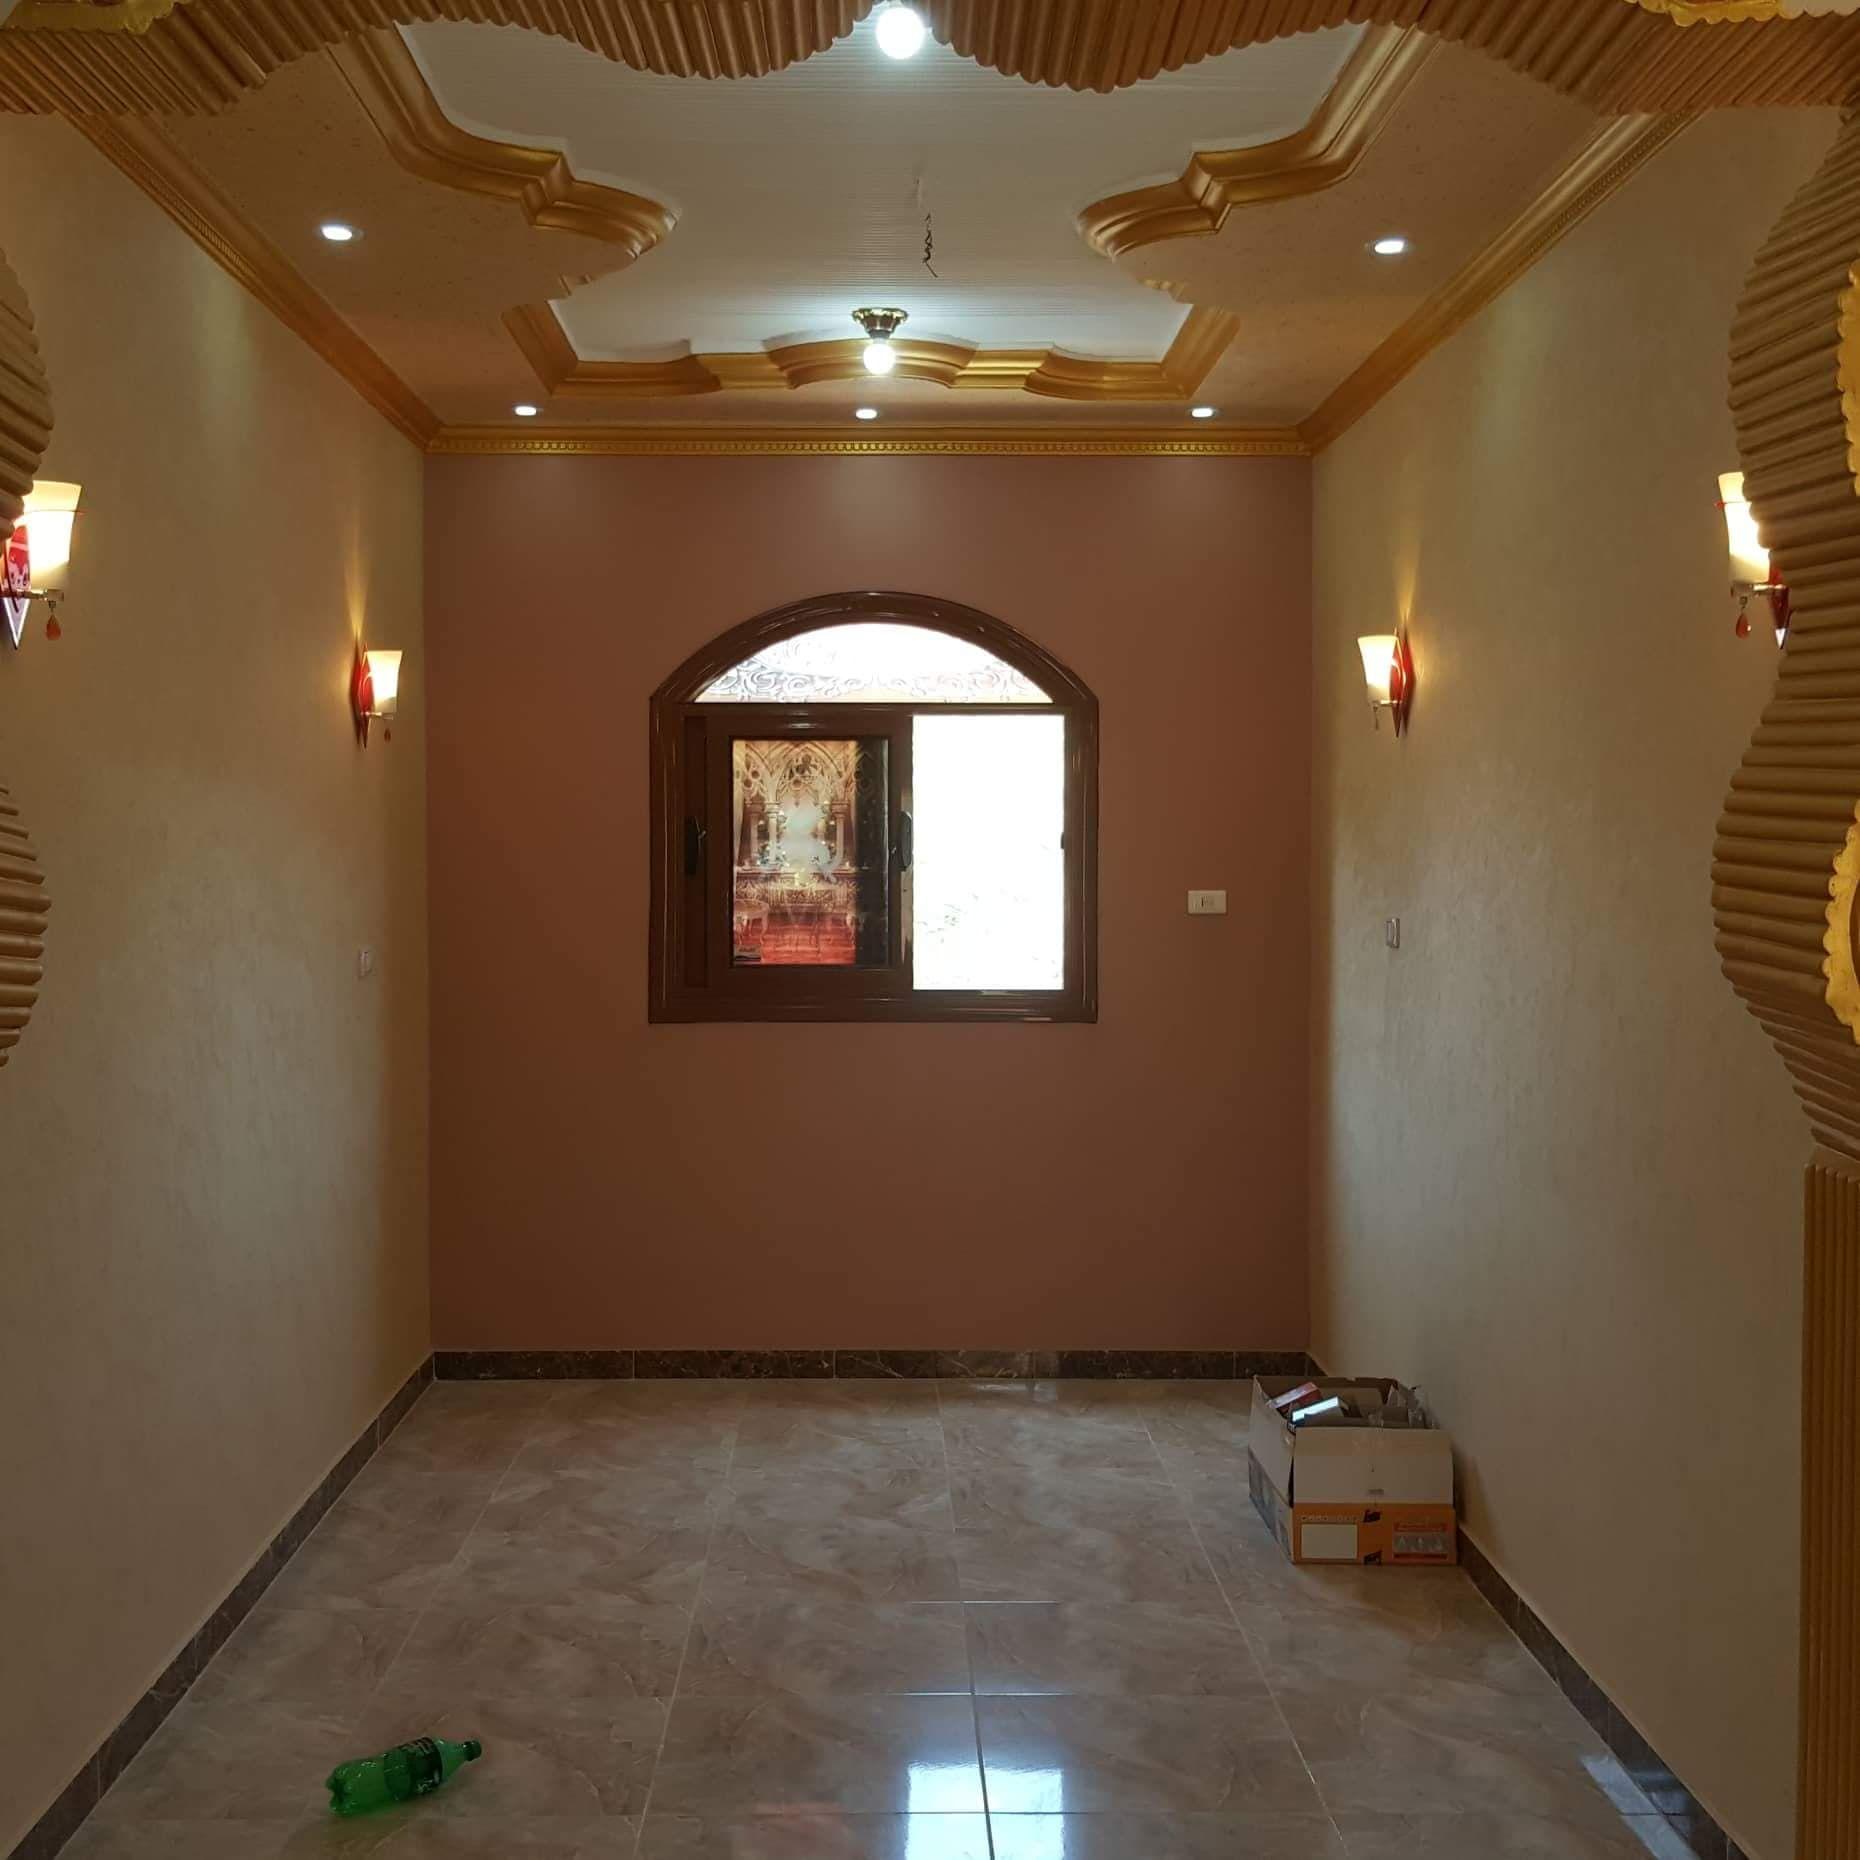 شركة تنظيف خزانات بالظهران Home Decor Ceiling Lights Decor